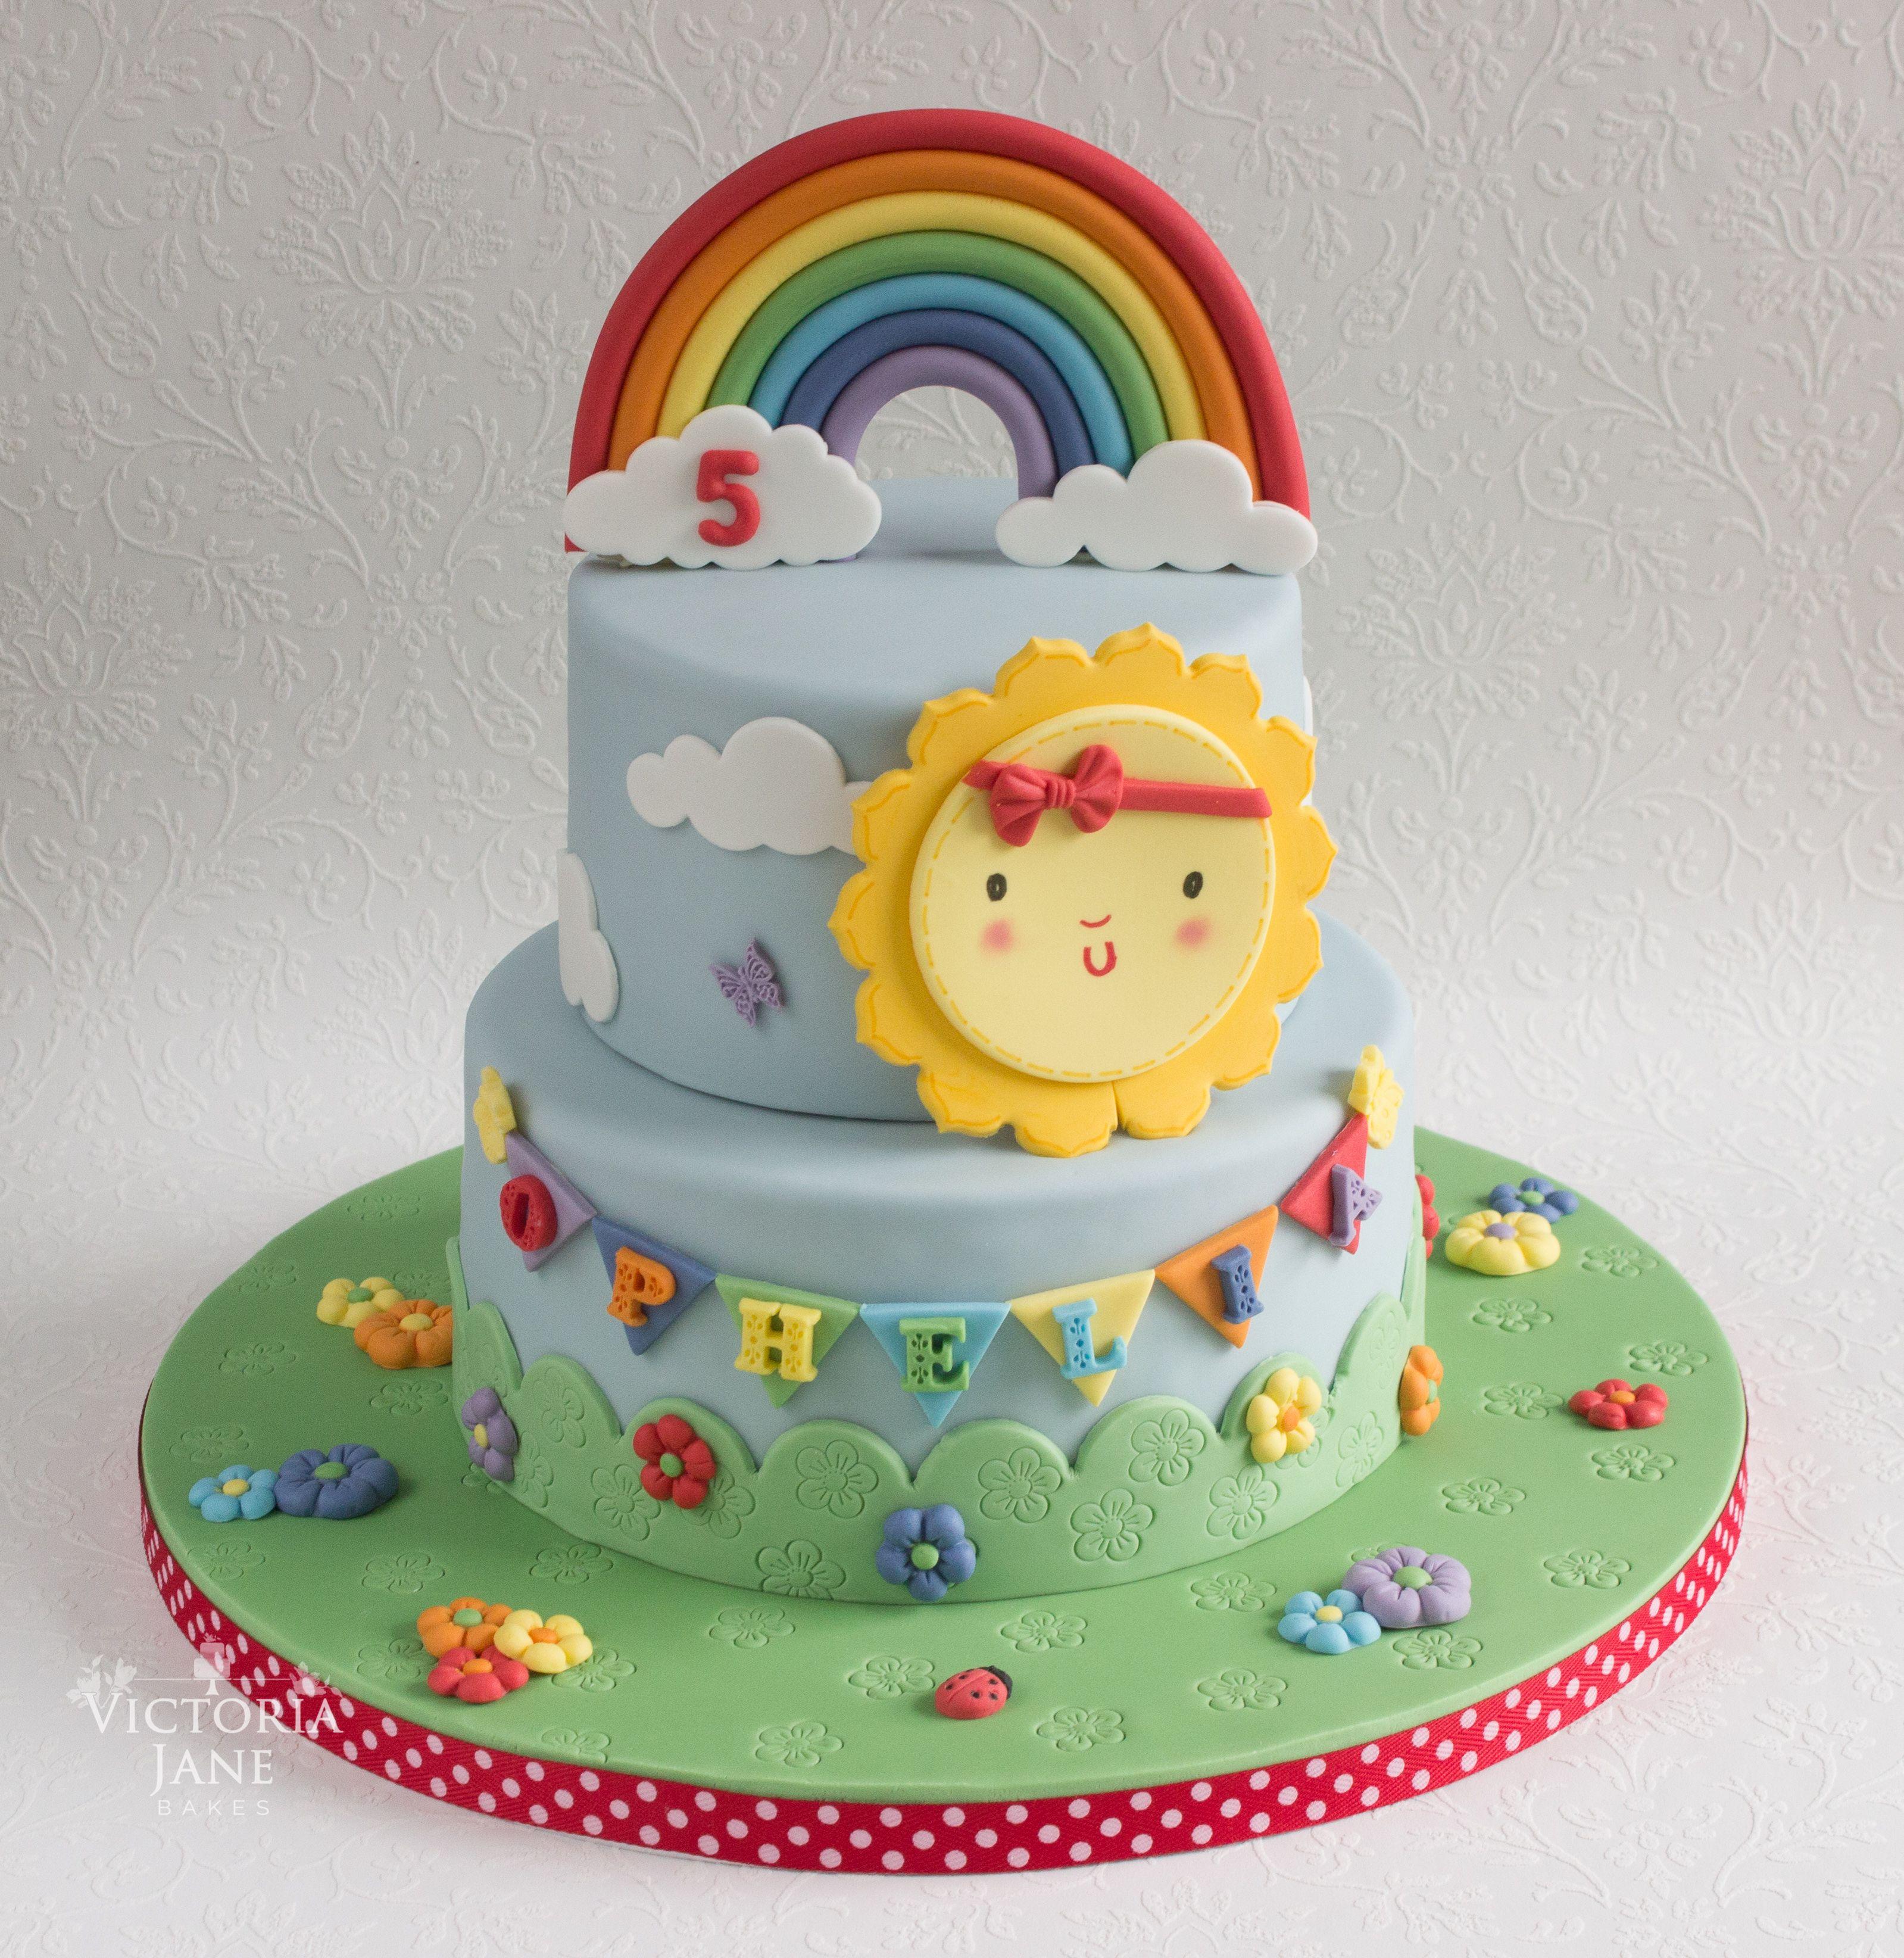 Sunshine And Rainbow Cake With Images Rainbow Birthday Cake Sunshine Cake Novelty Birthday Cakes